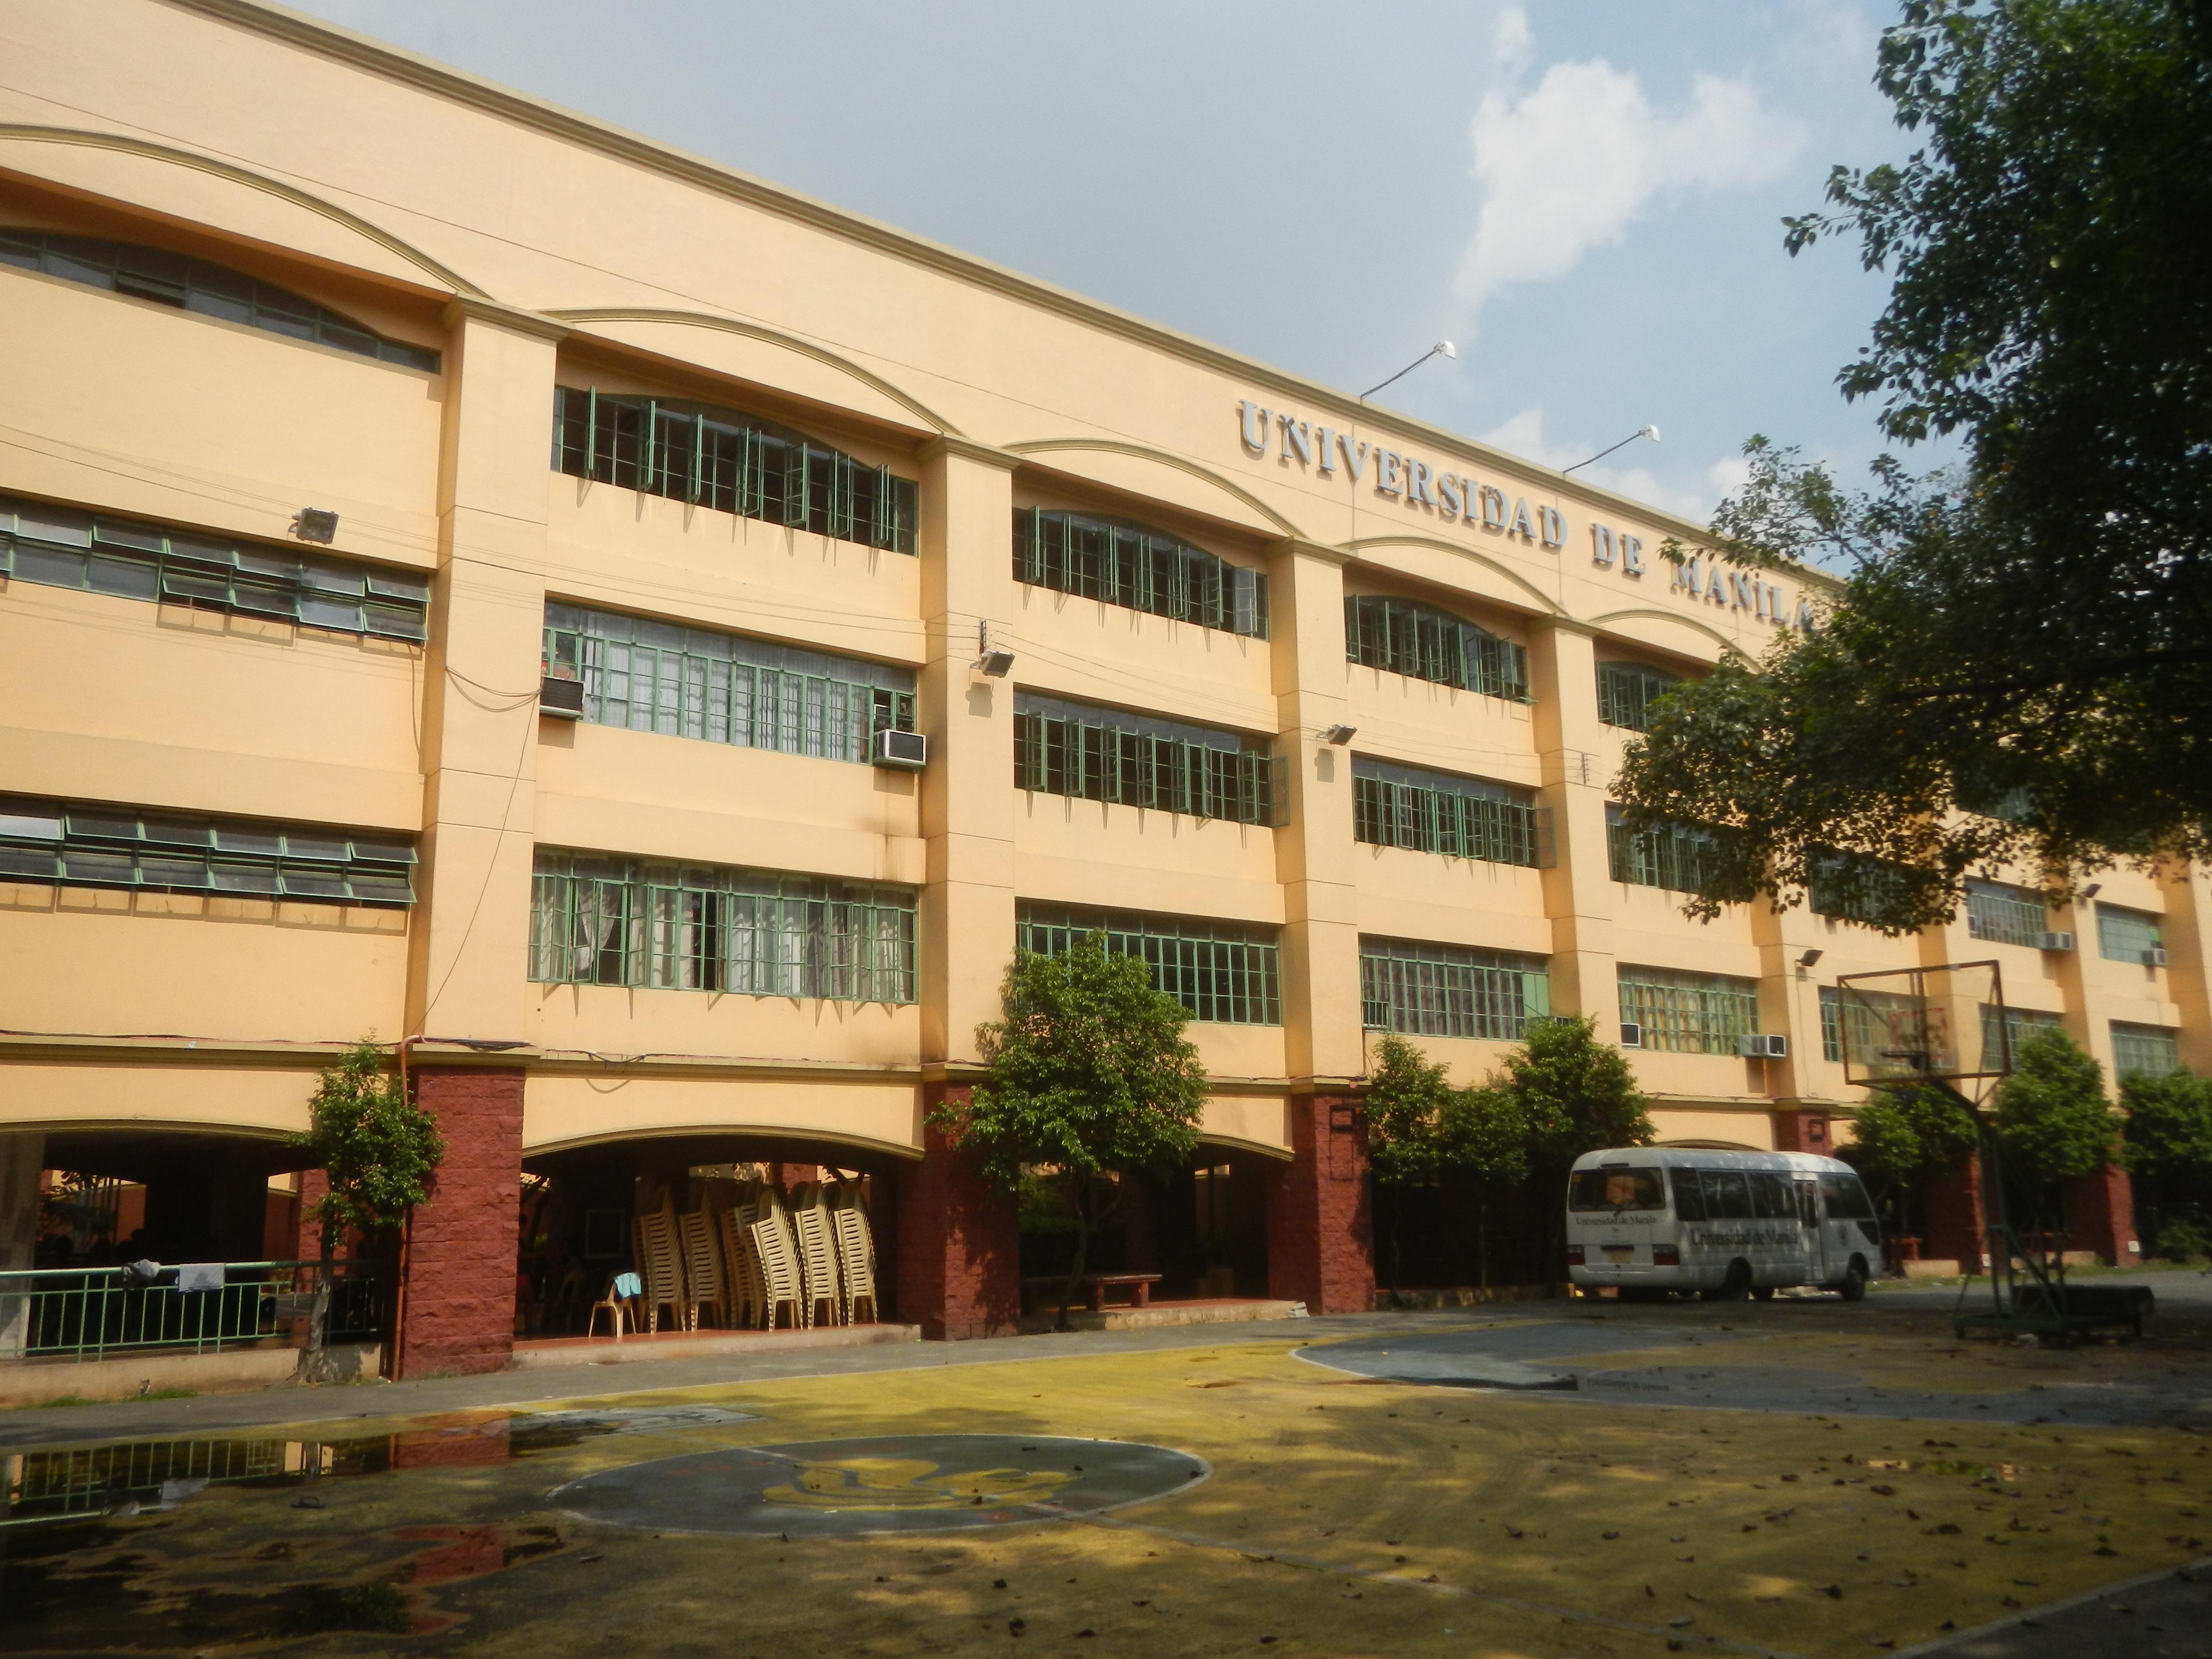 File:71Mehan Garden Ermita Manila Universidad de Manila 15.jpg ...